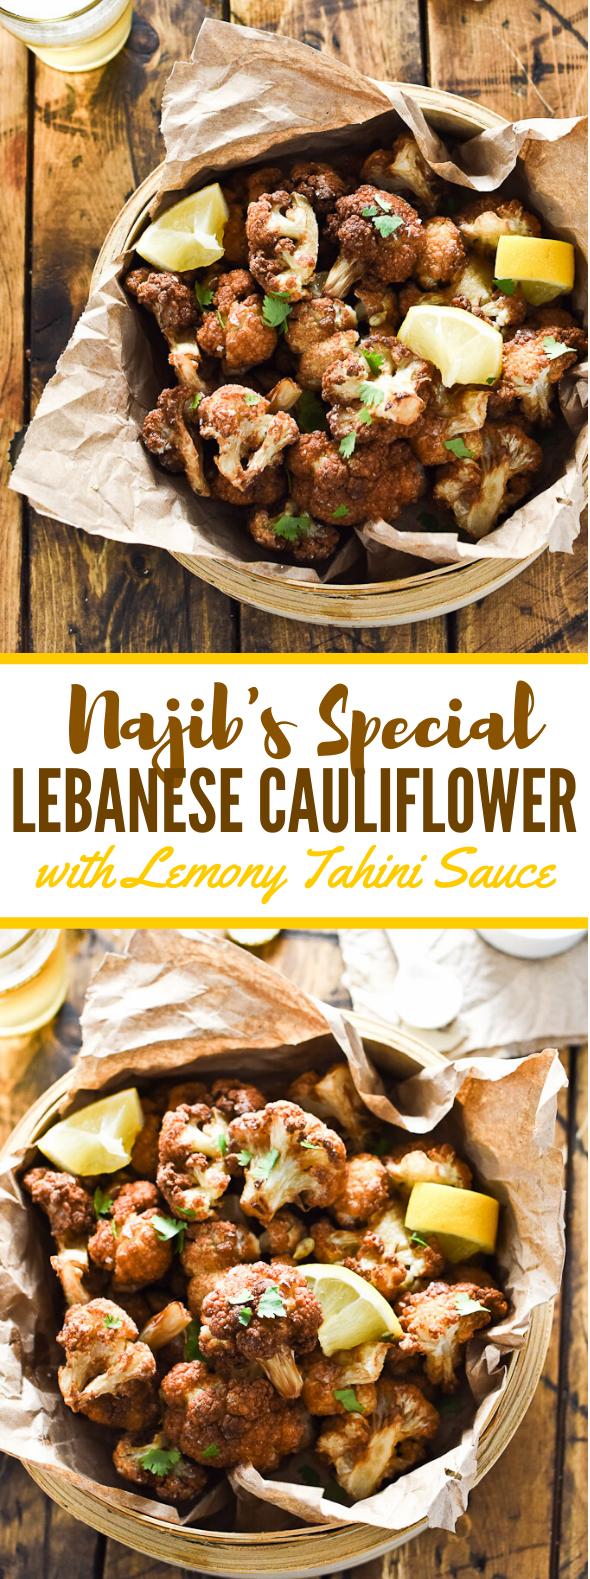 NAJIB'S SPECIAL LEBANESE CAULIFLOWER #vegetarian #healthy